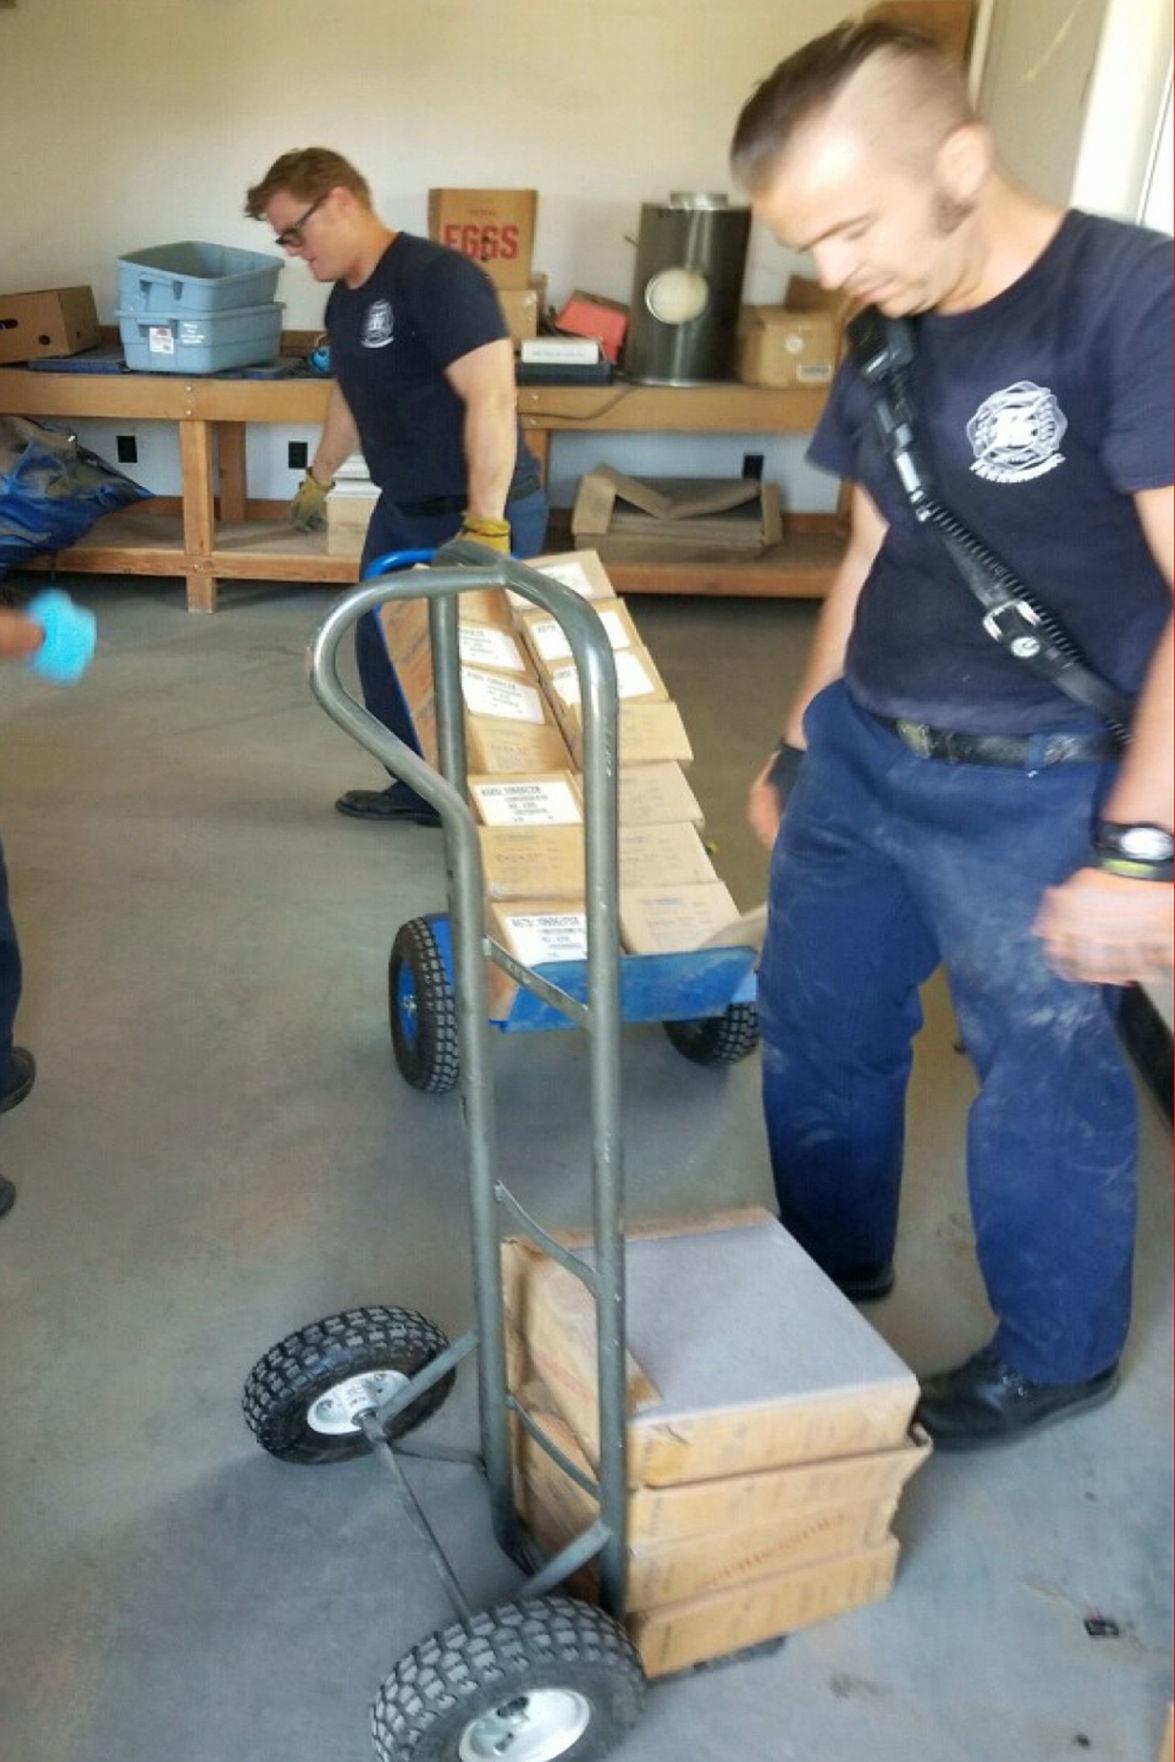 Kingsburg Fire Station: Clean up